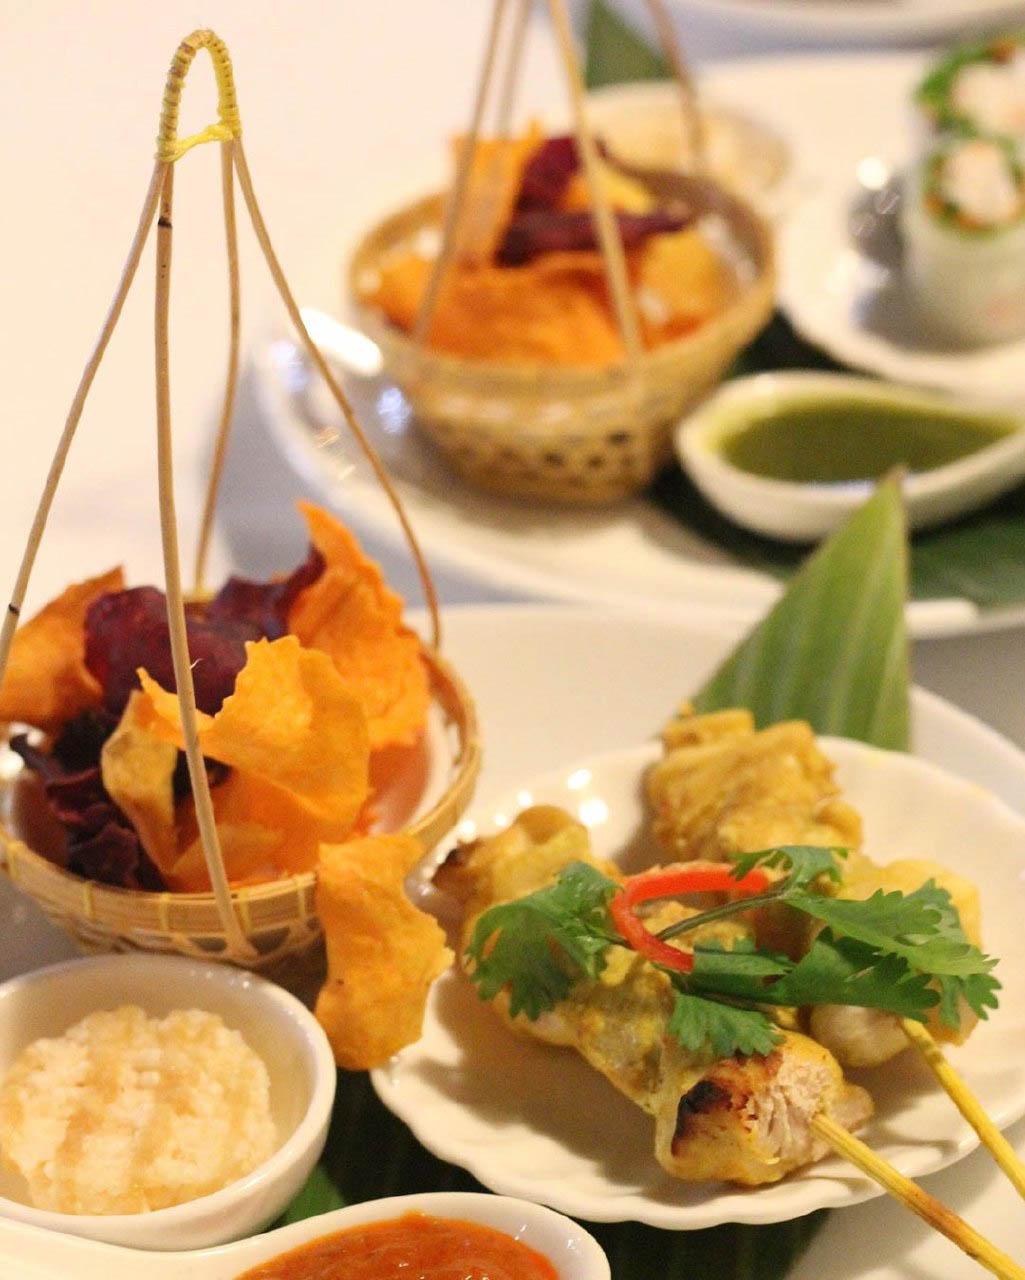 Dempsey Hil Restaurants - Jim Thompson Thai Restaurant food